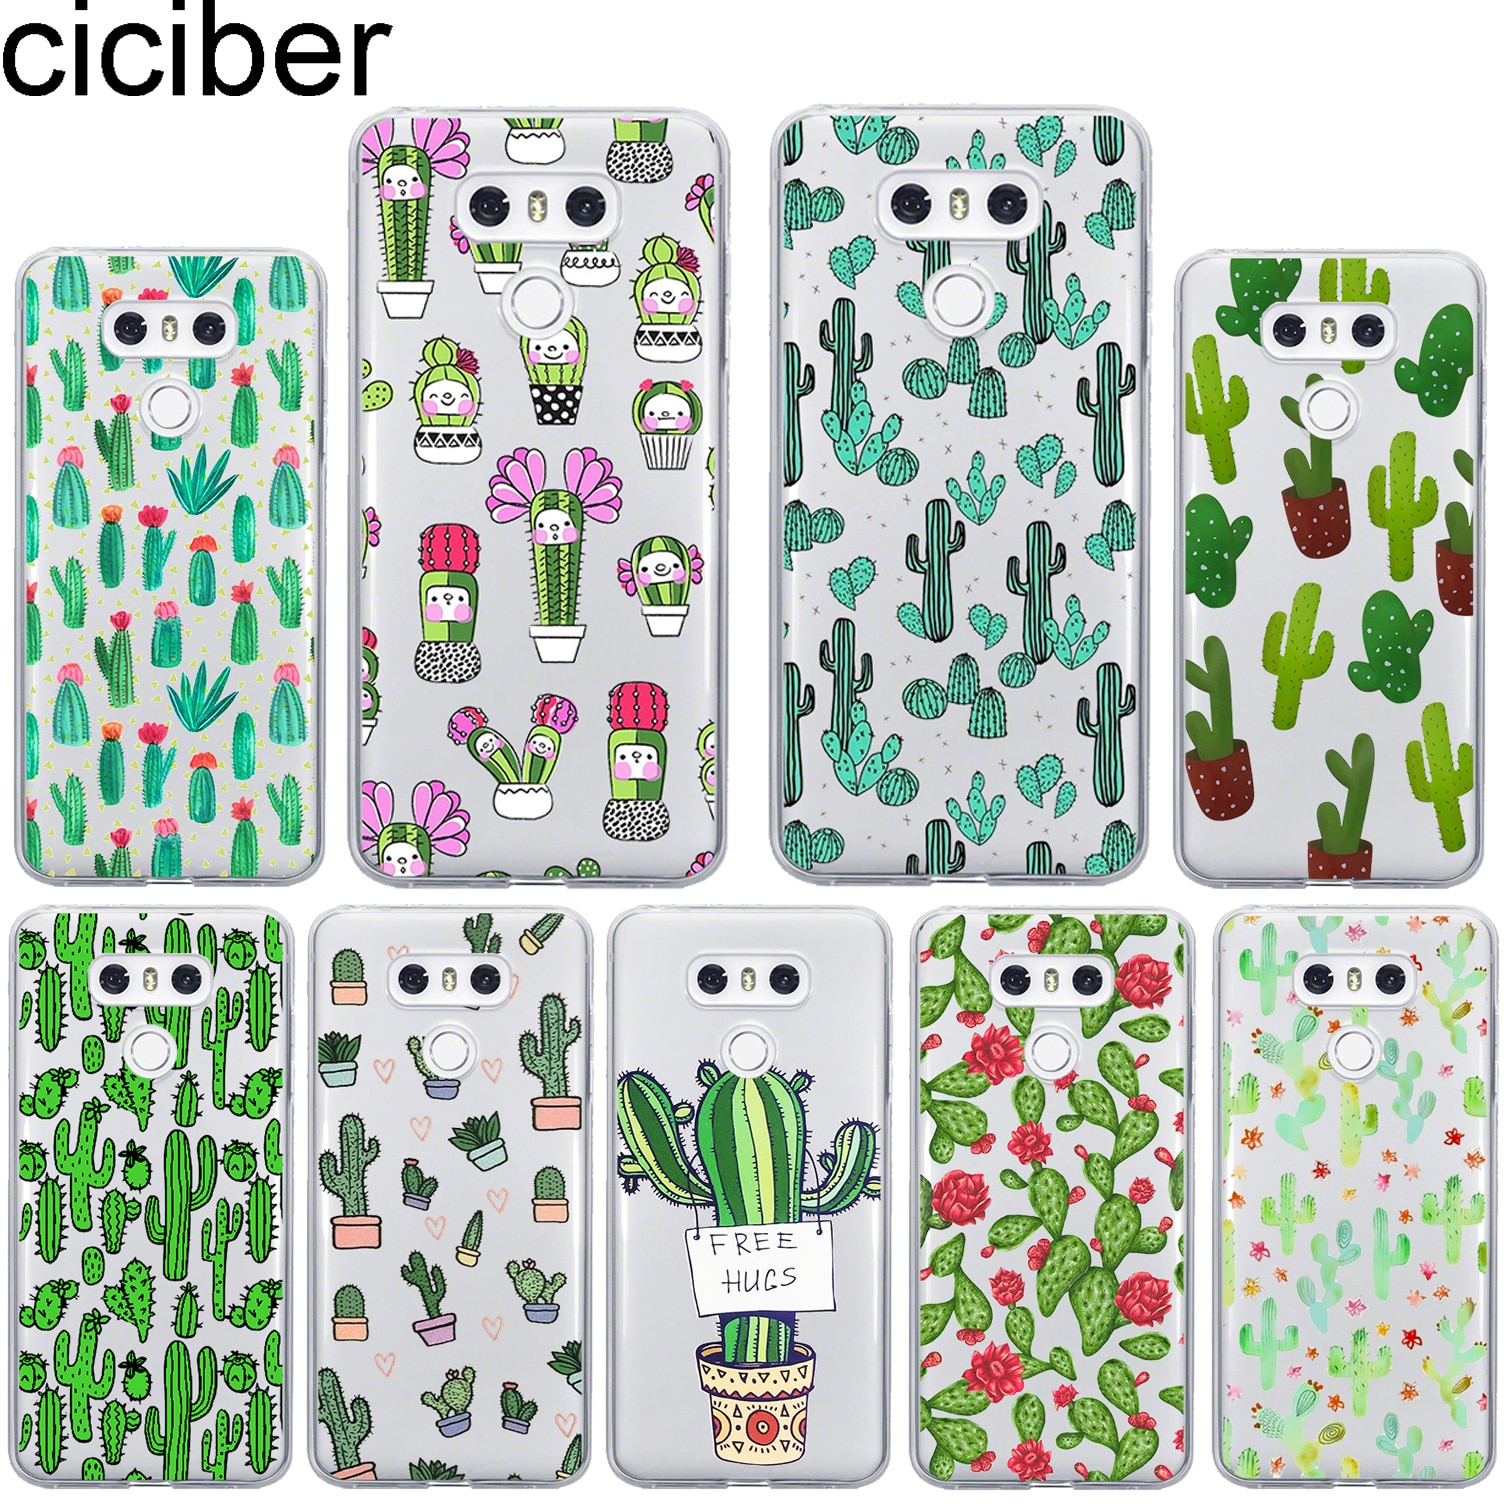 ciciber For LG G7 G6 V40 V35 V30 V20 THINQ Soft Silicone TPU Phone Cute Cactus Case For LG K8 K10 K4 2017 2018 K9 K11 Plus Case